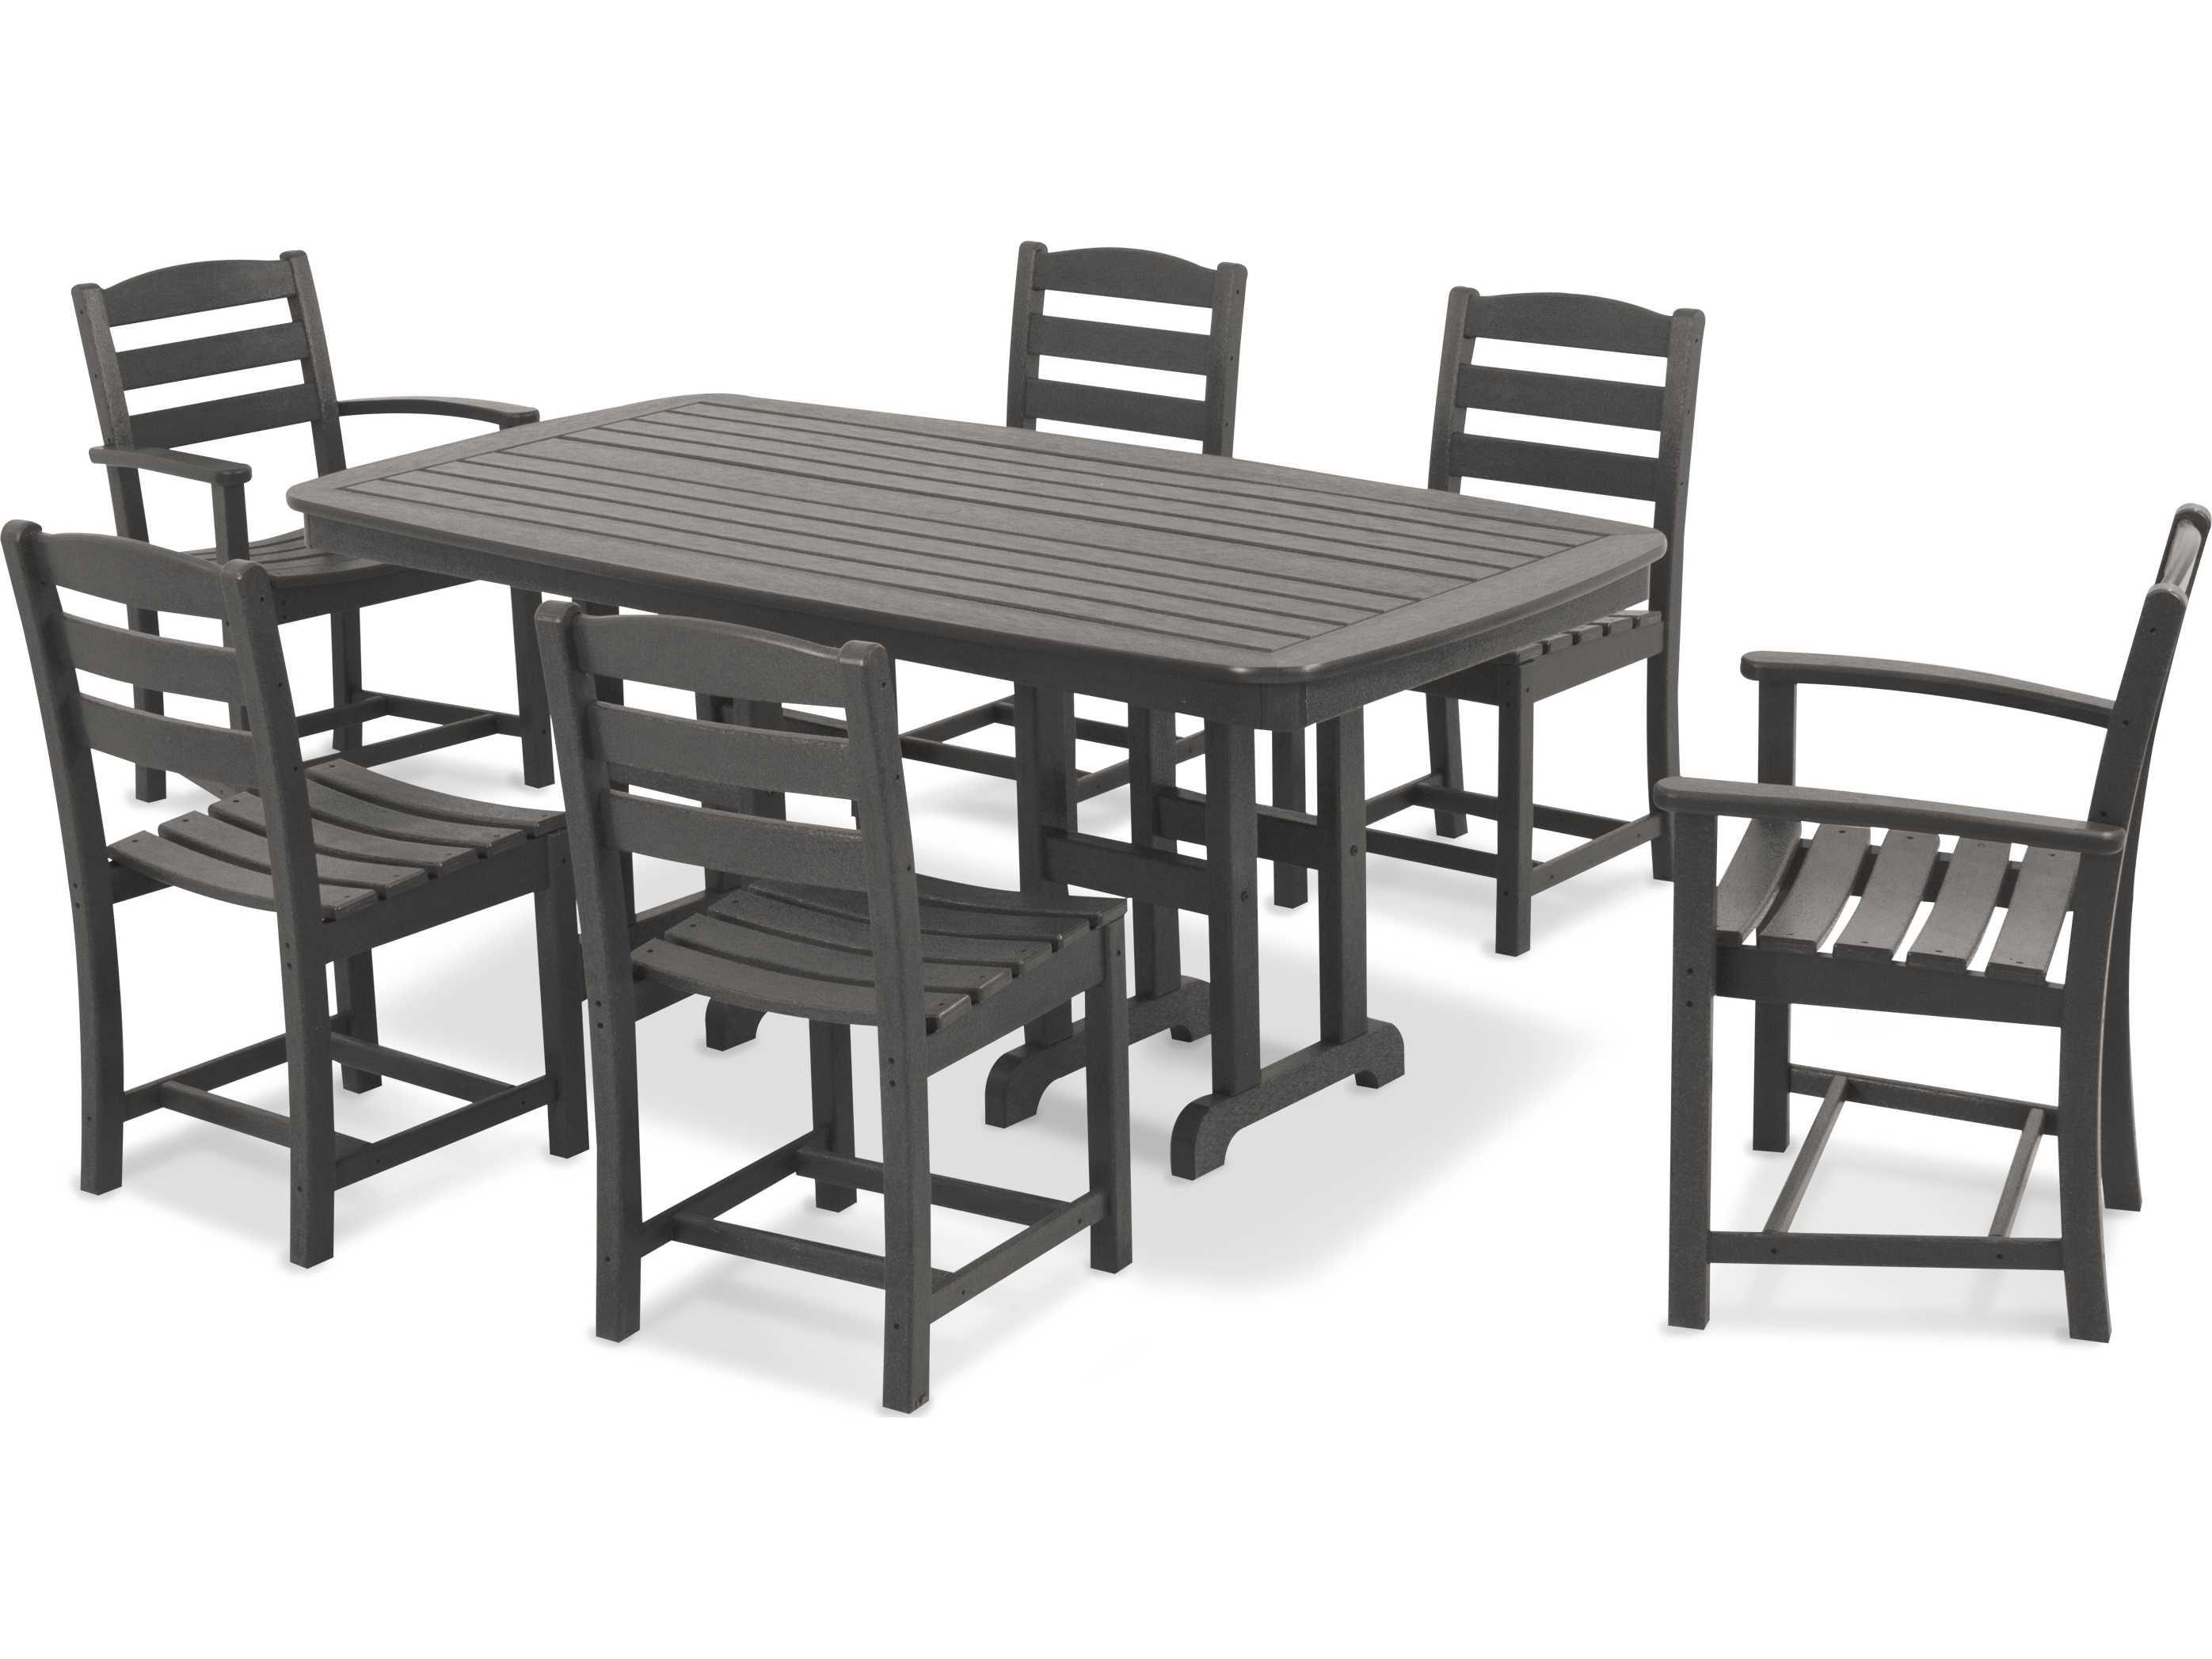 Polywood La Casa Cafe Recycled Plastic 7 Piece Dining Set Trex